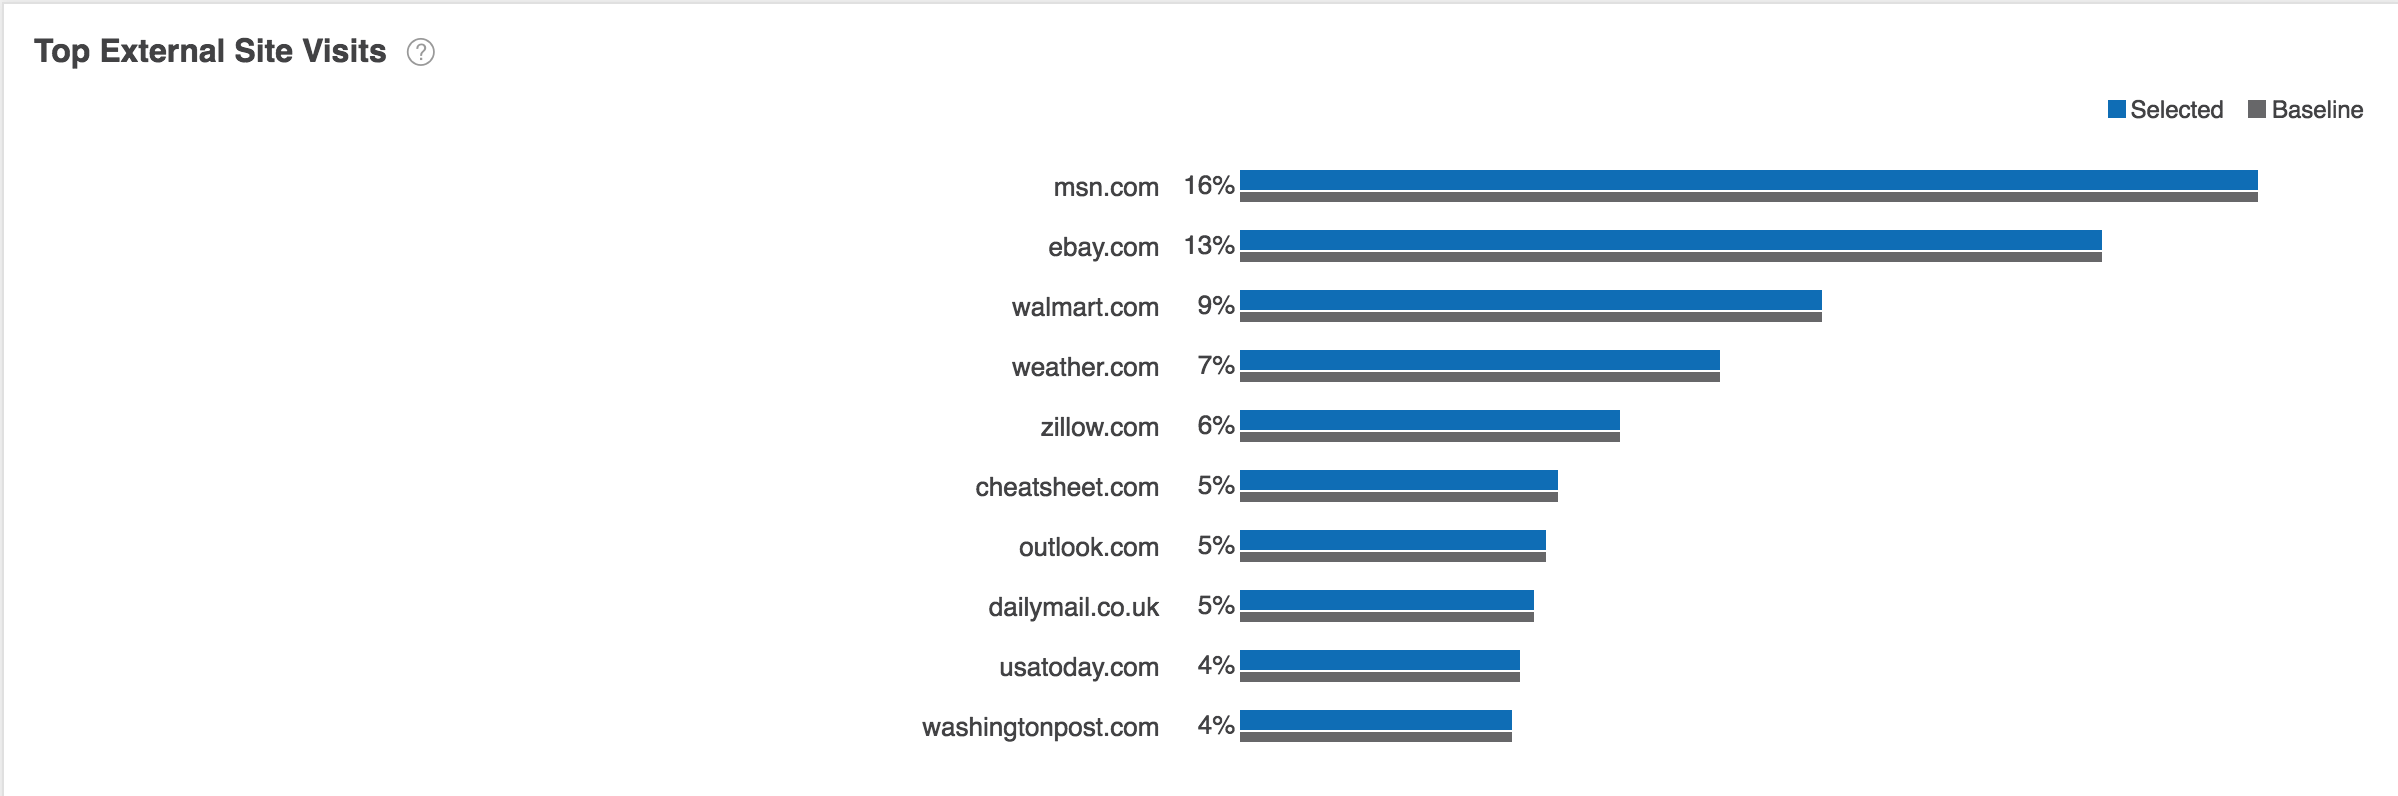 Top External Site Visits Report